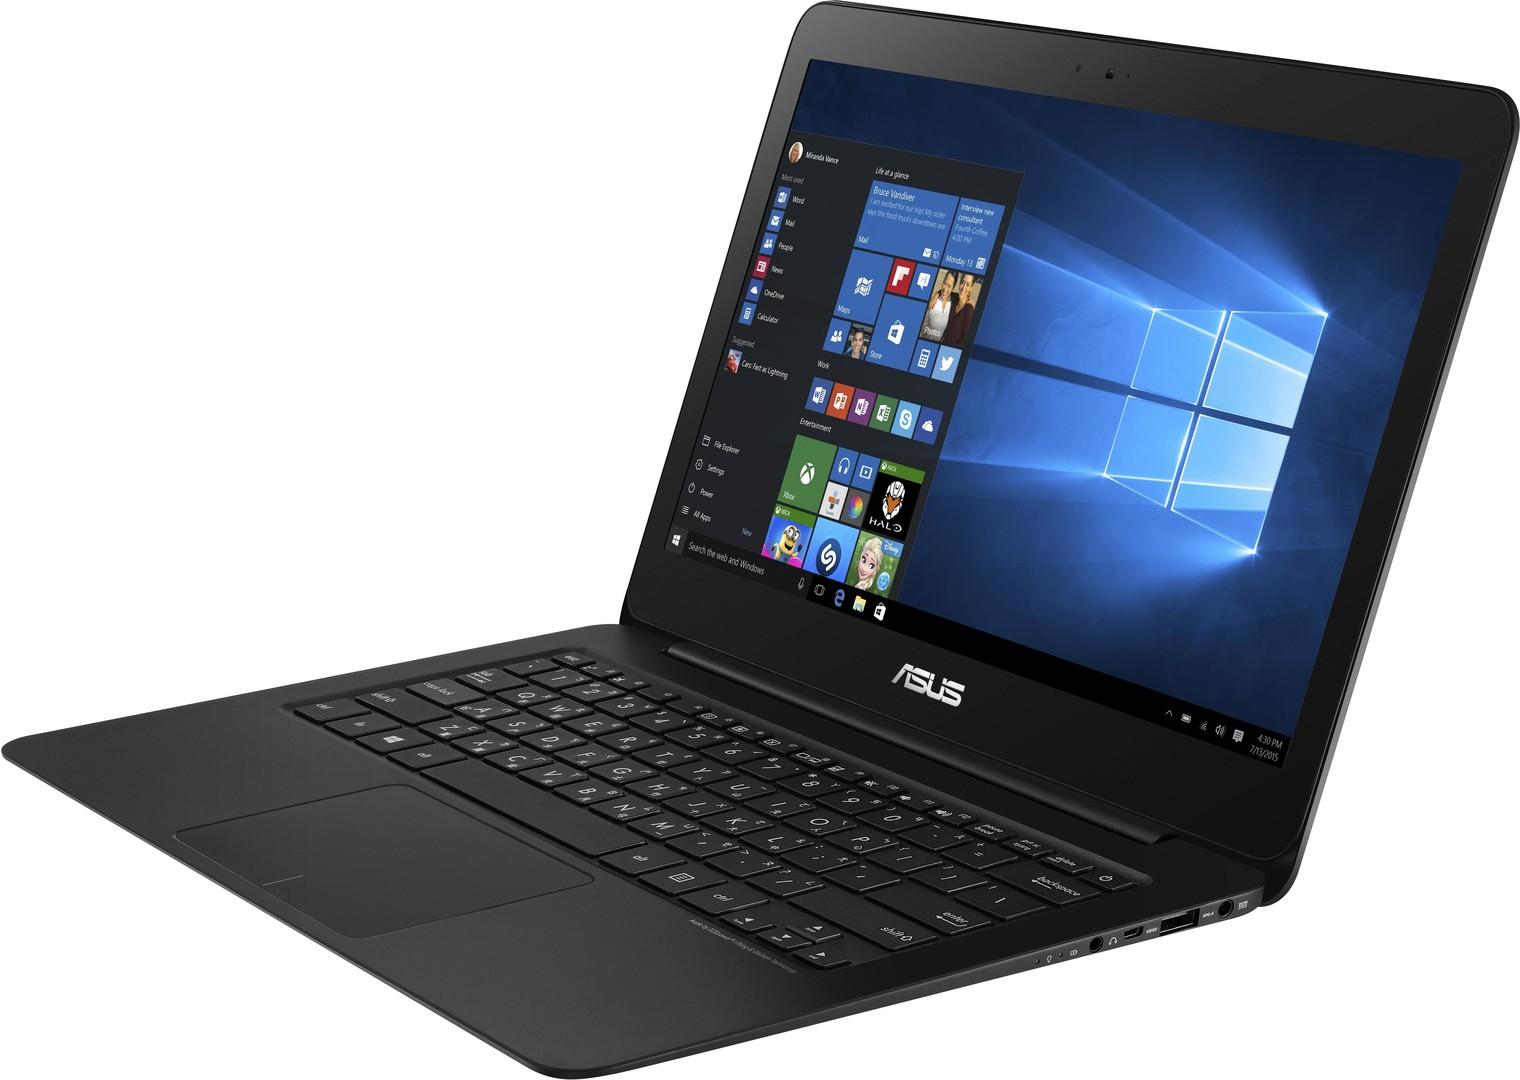 ASUS UX305CA-DQ029T m5-6Y54/8GB/256GB SSD/13,3'' QHD(3200x1800)/Win10/black